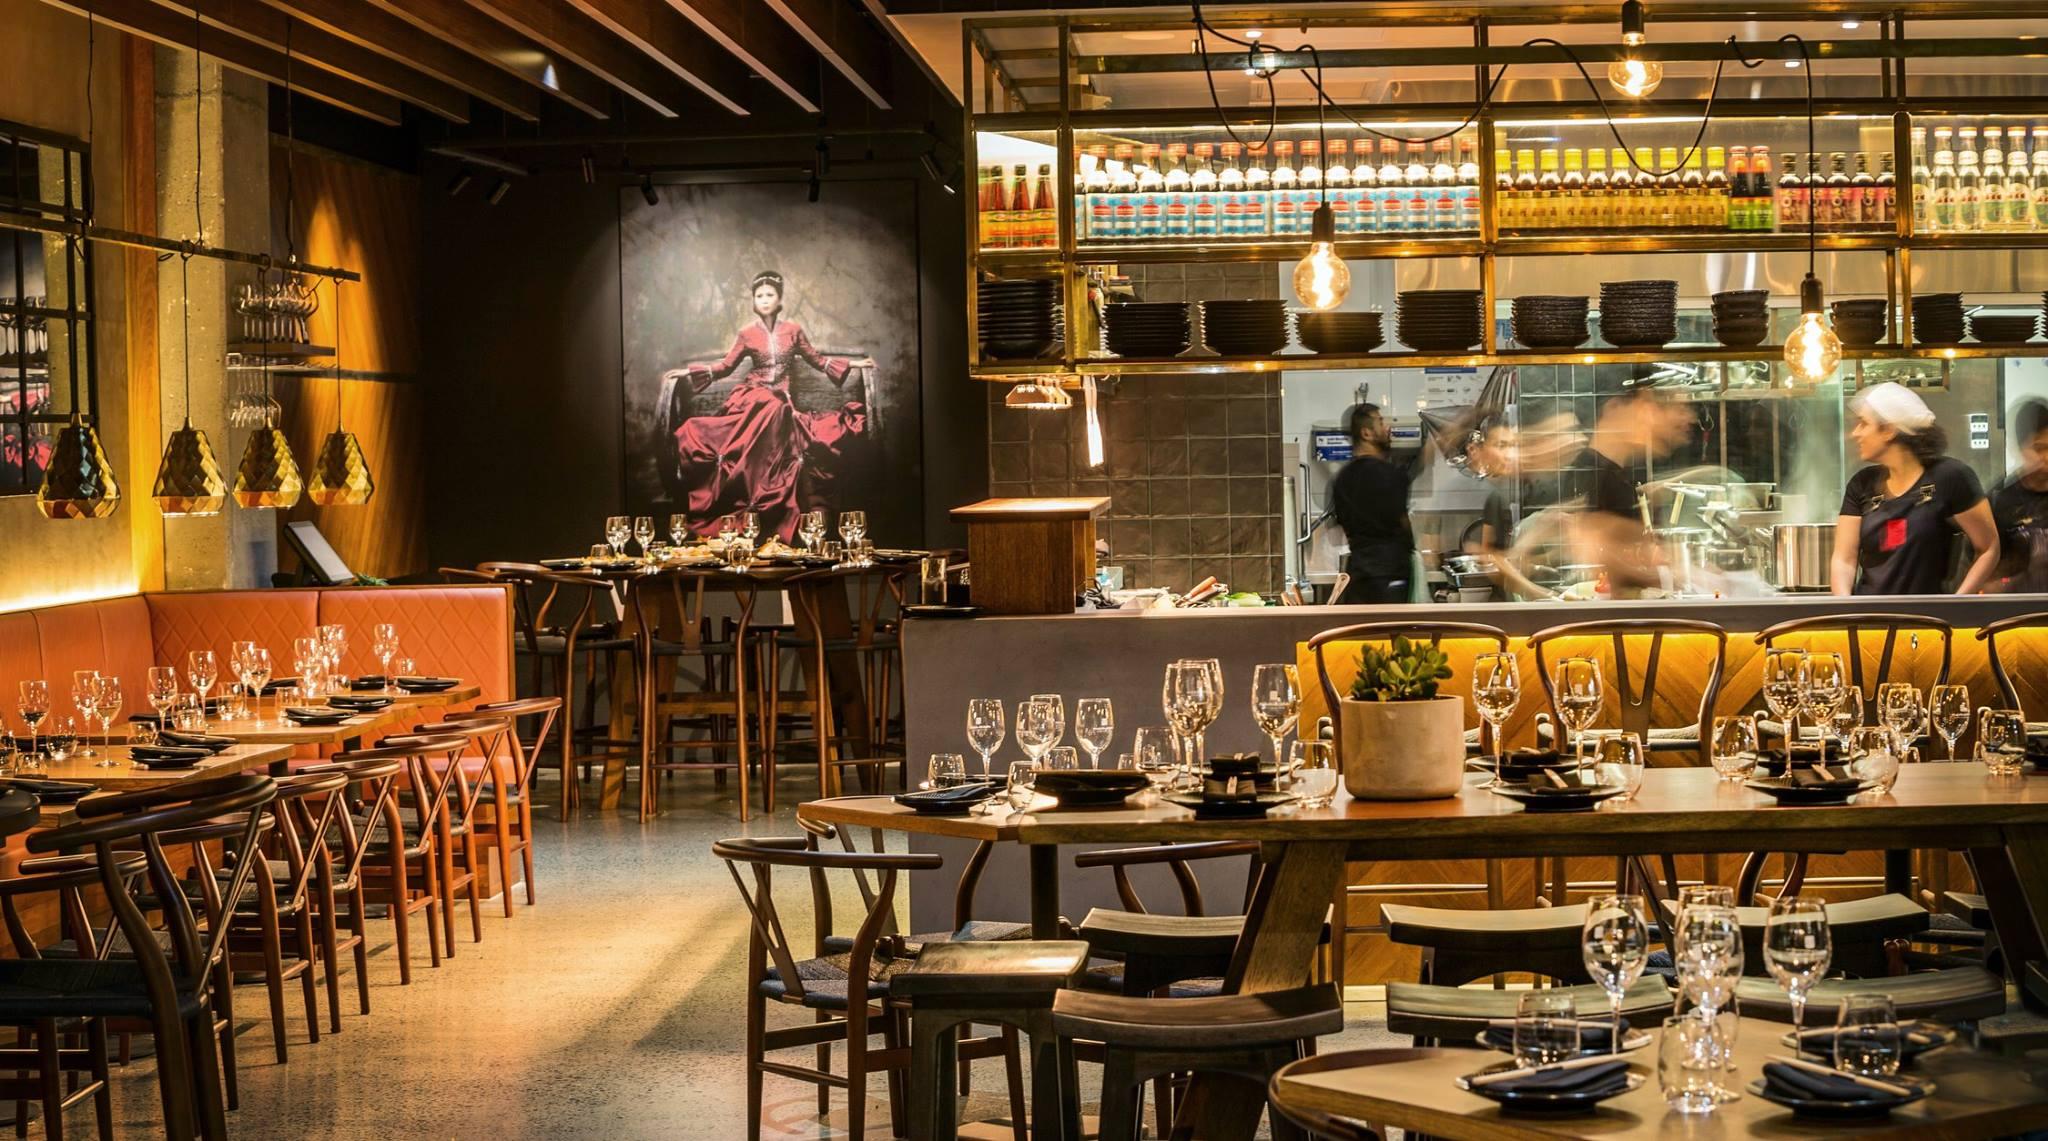 mamasan kitchen bar oracle braodbeach spacecubed design interior shopfitting clubbar concepts gold coast australia 1